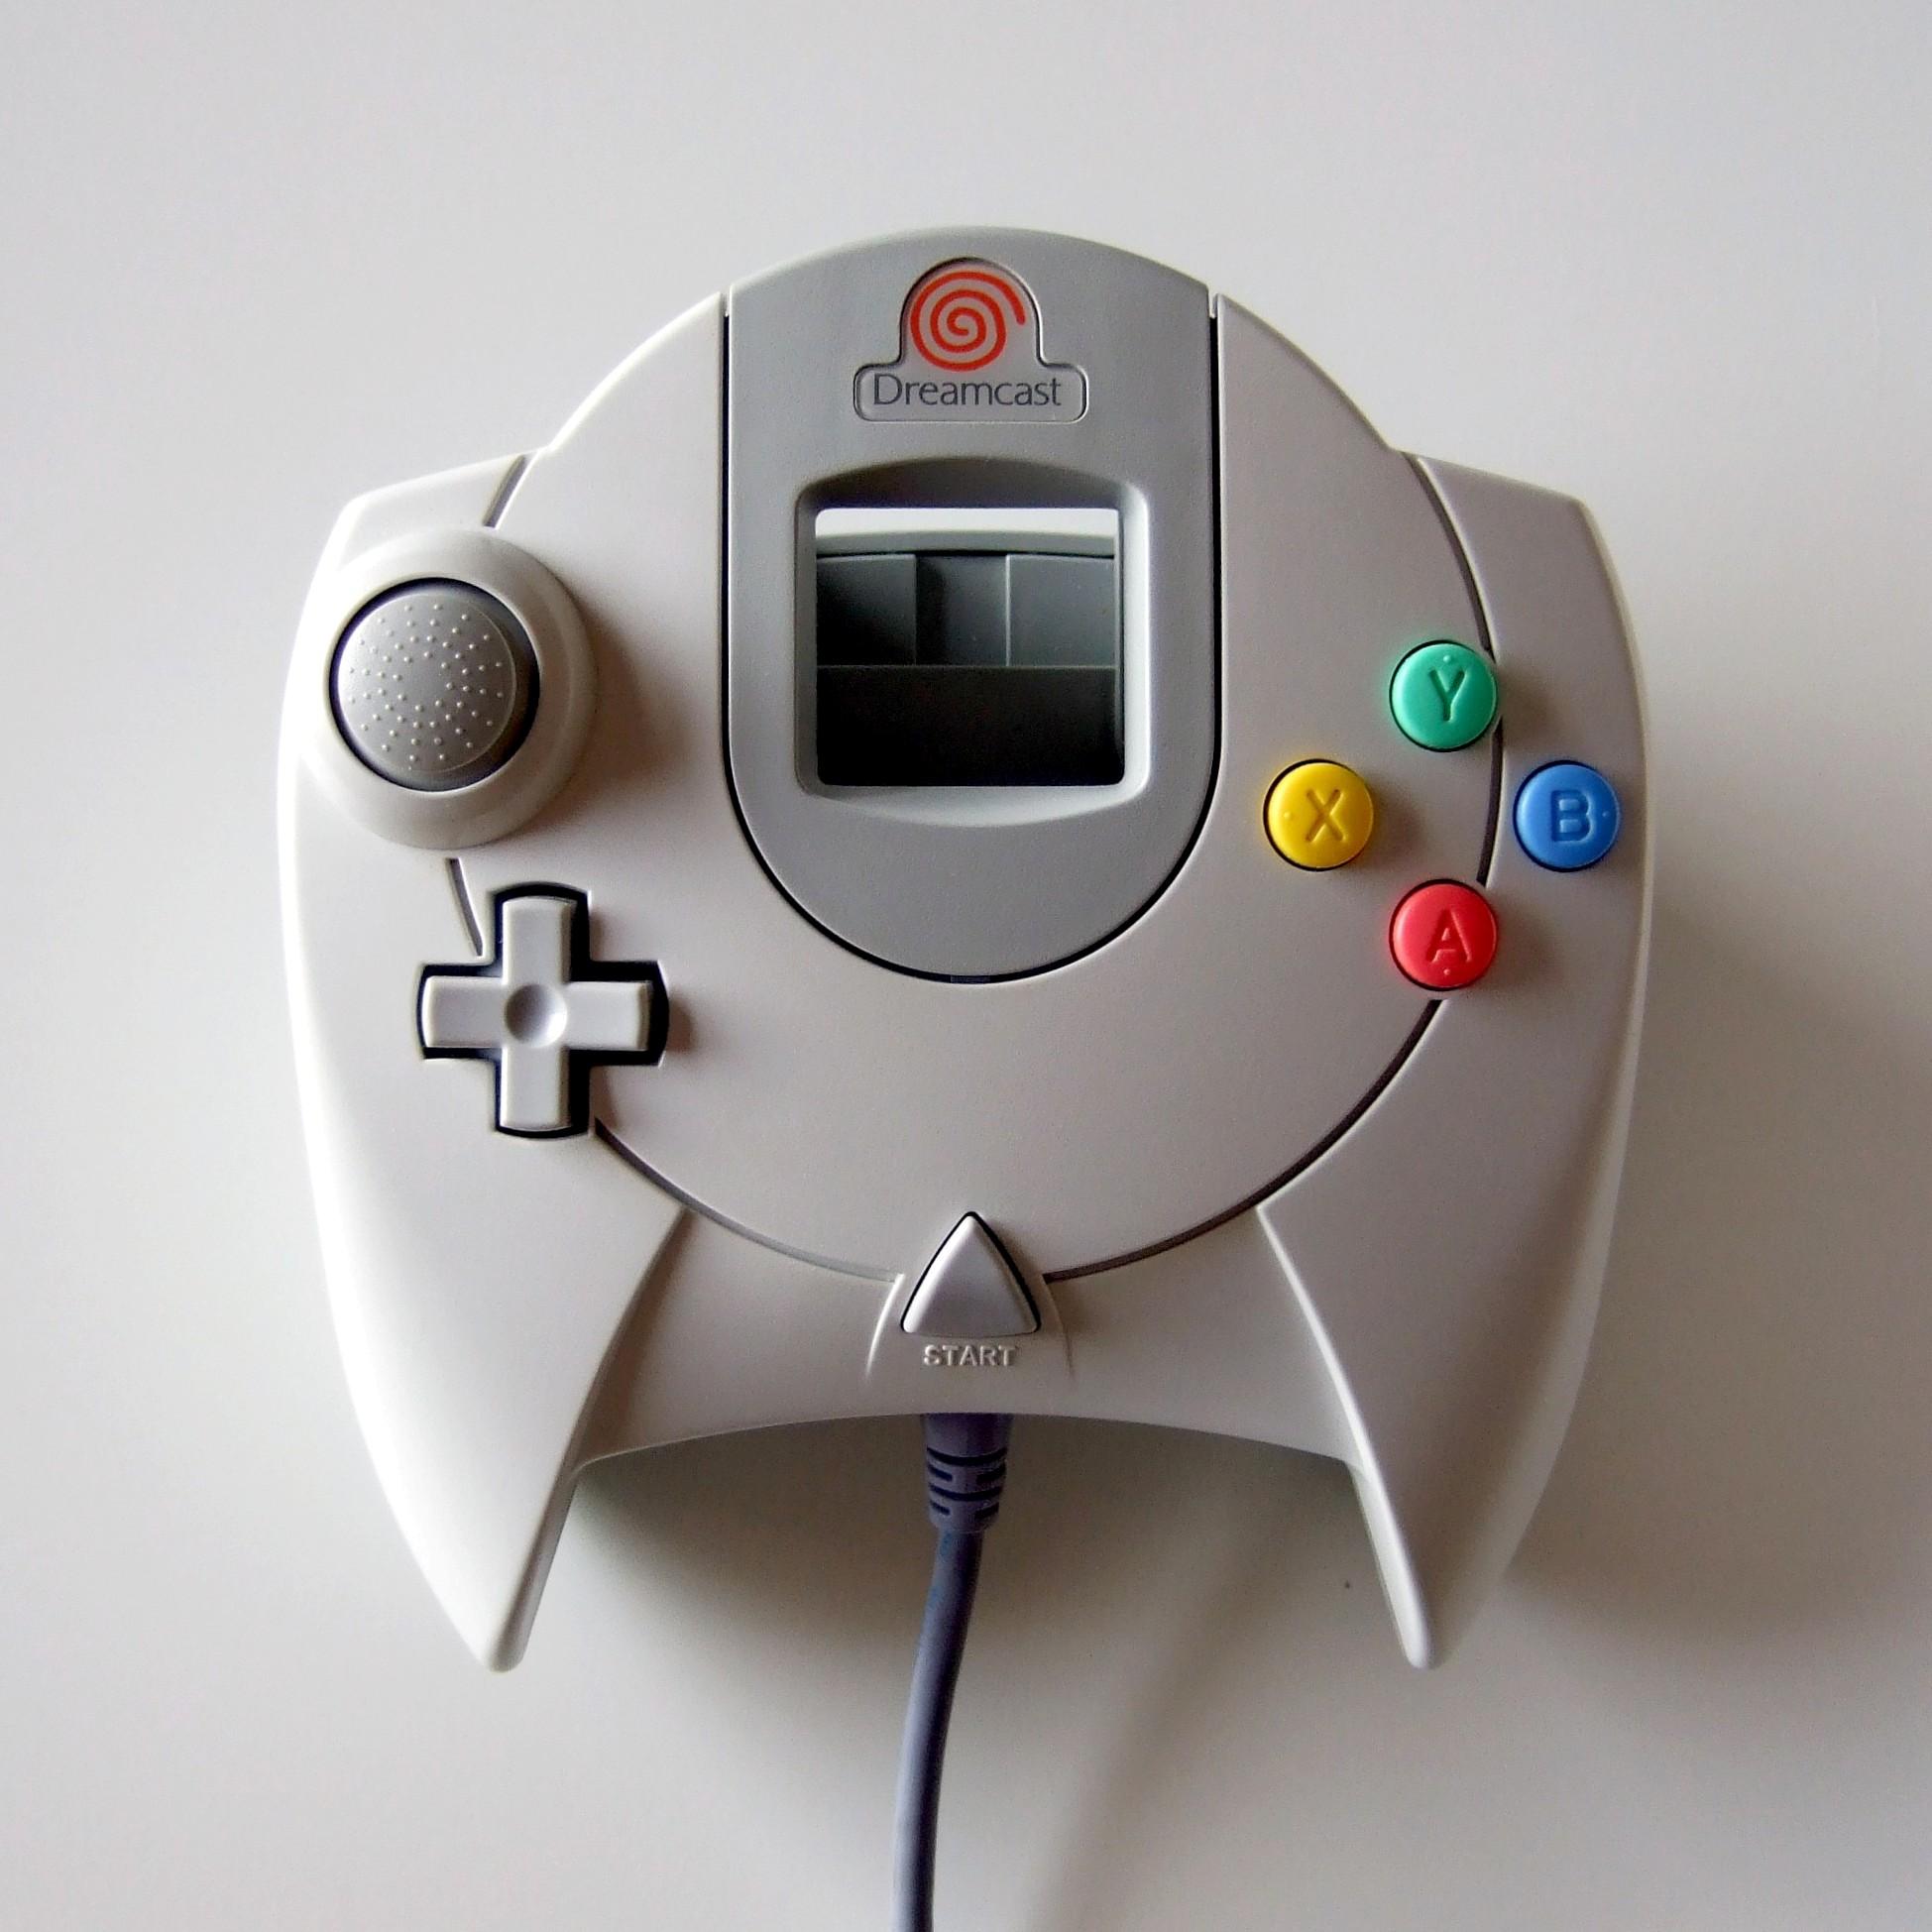 File:Dreamcast controller (lit from left).jpg